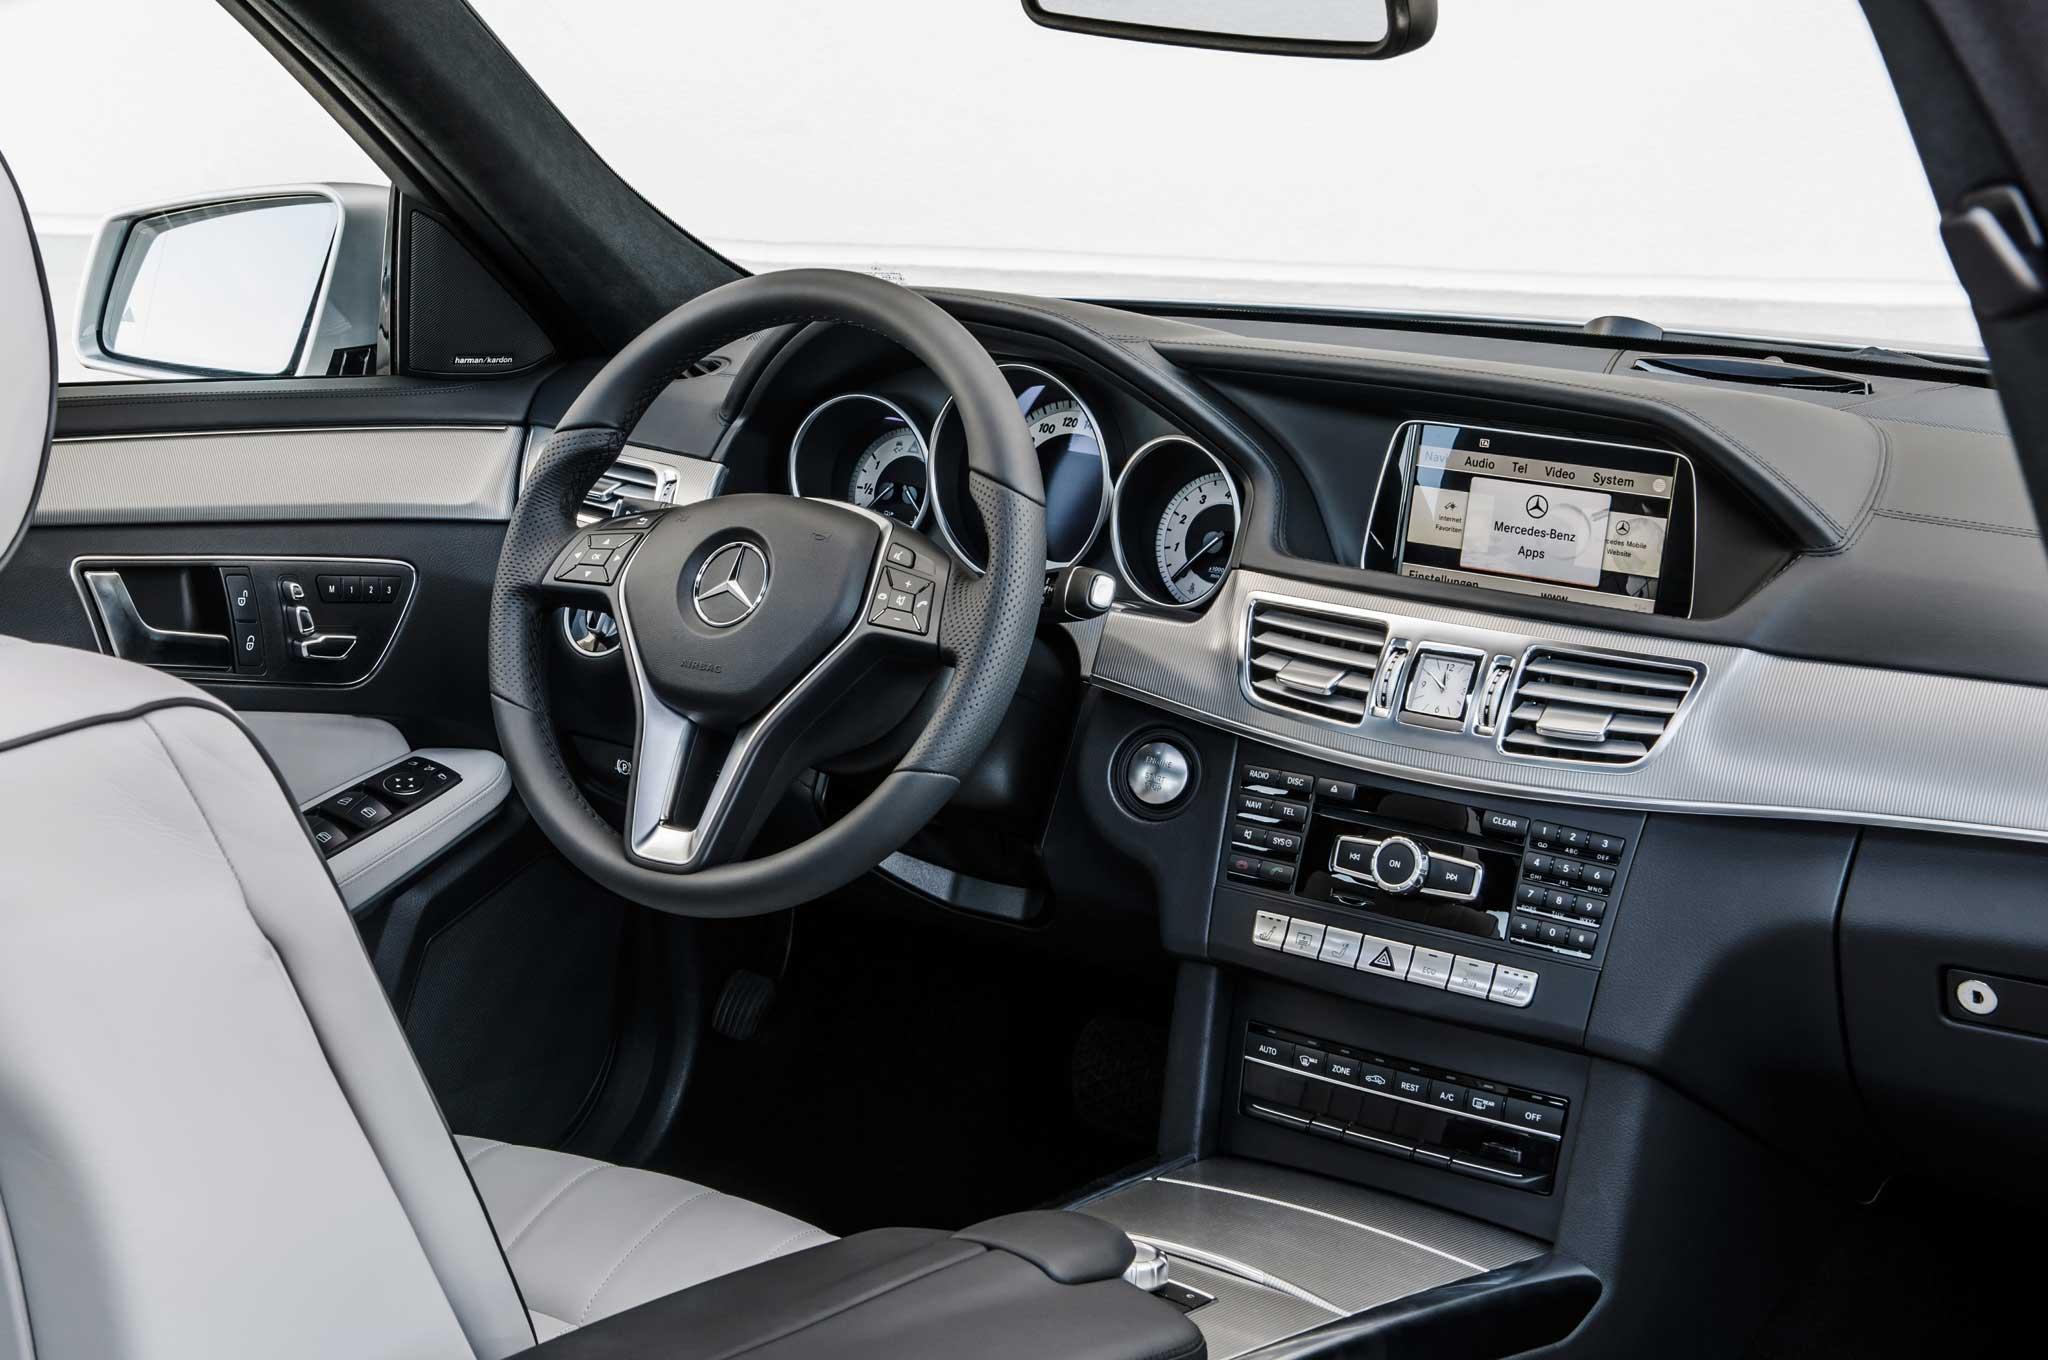 2014 mercedes e class interior images for Mercedes benz e350 interior